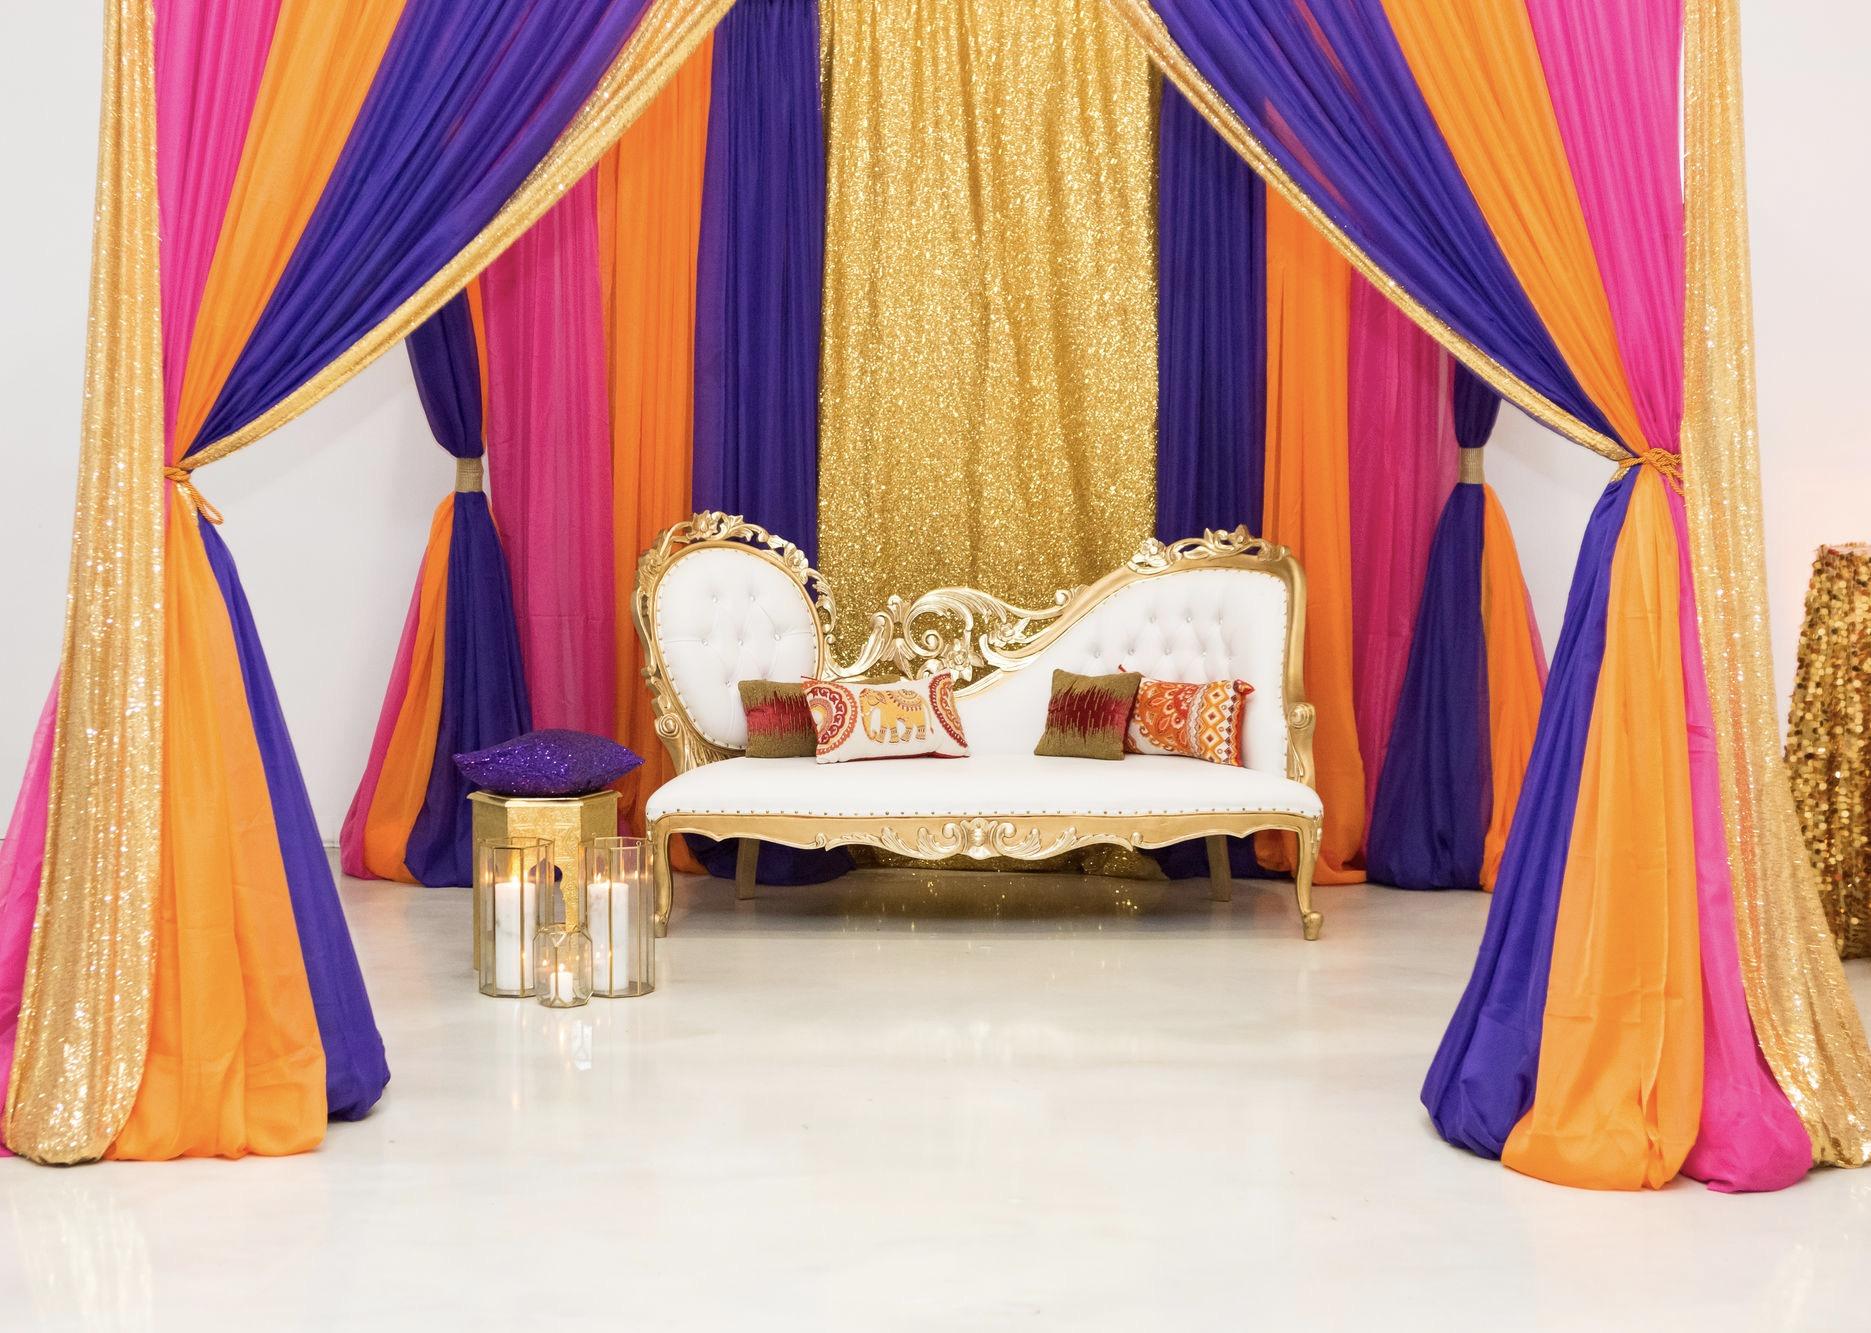 Luxury pkg H. Decor by @jloftevents